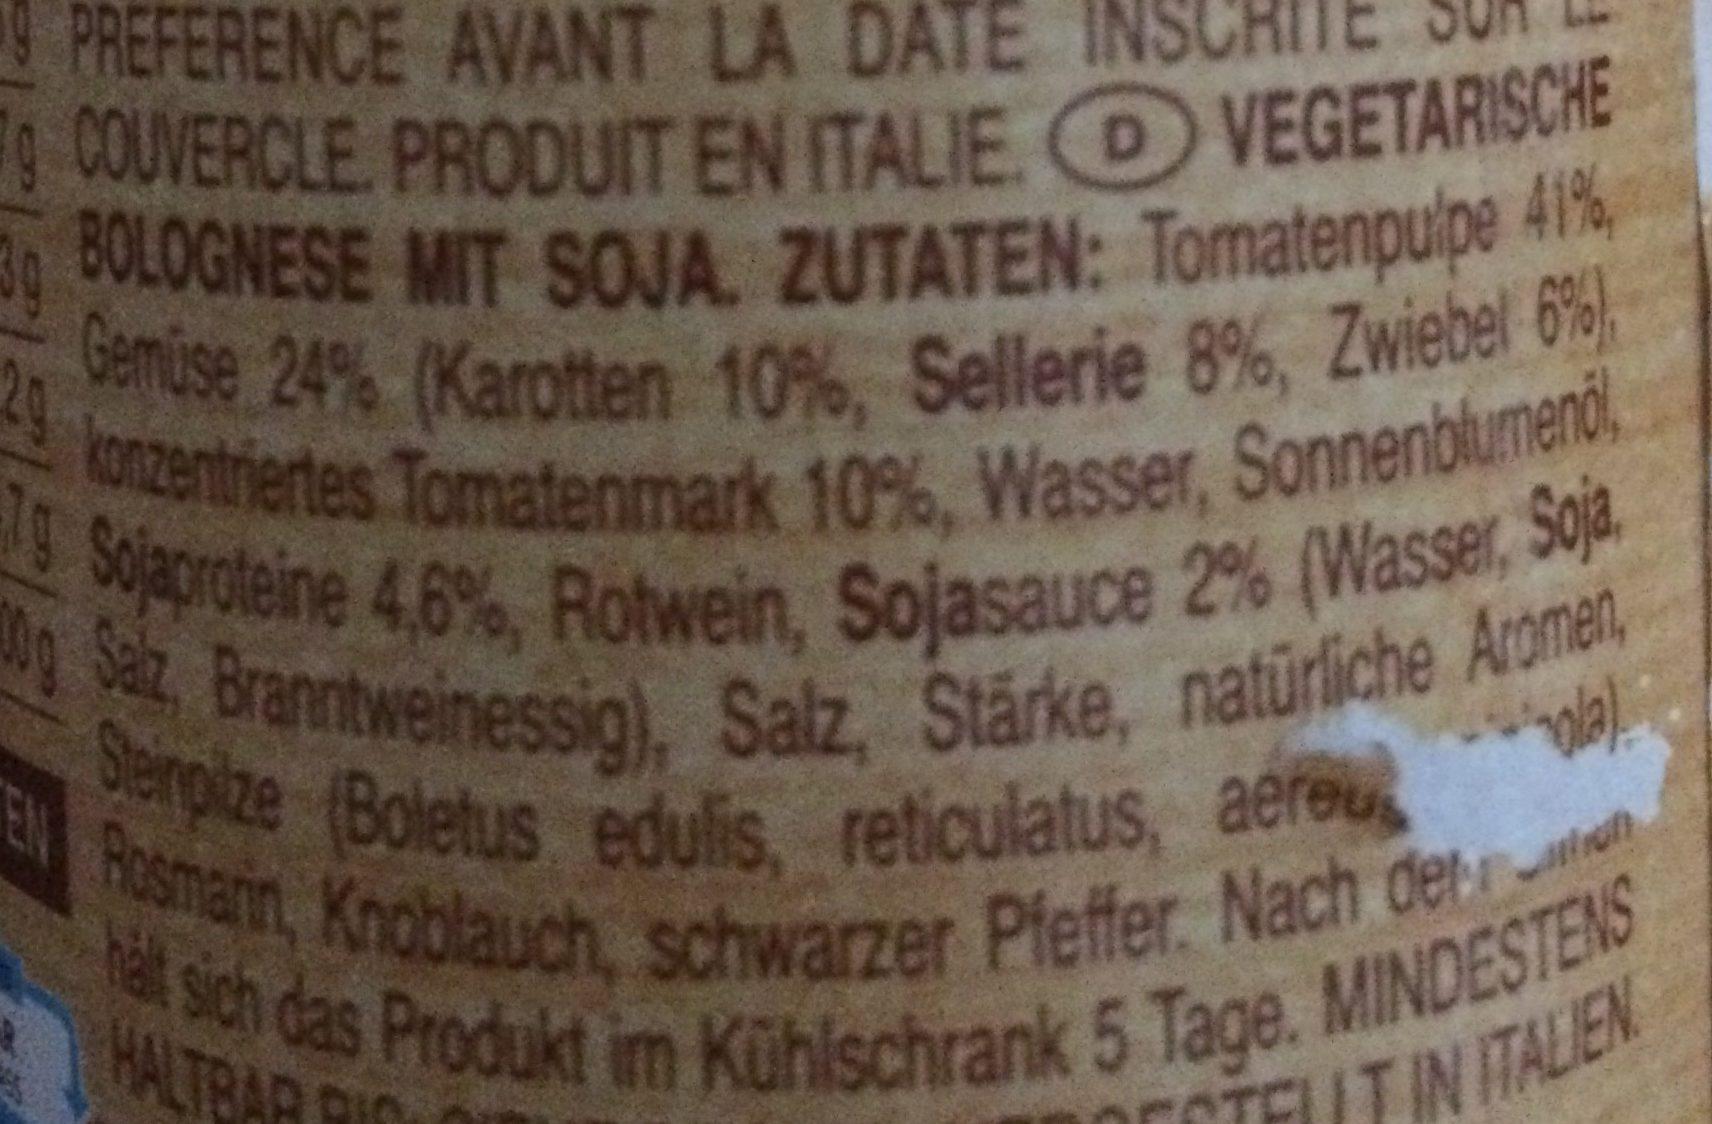 Sauce bolognaise au soja Vegan - Inhaltsstoffe